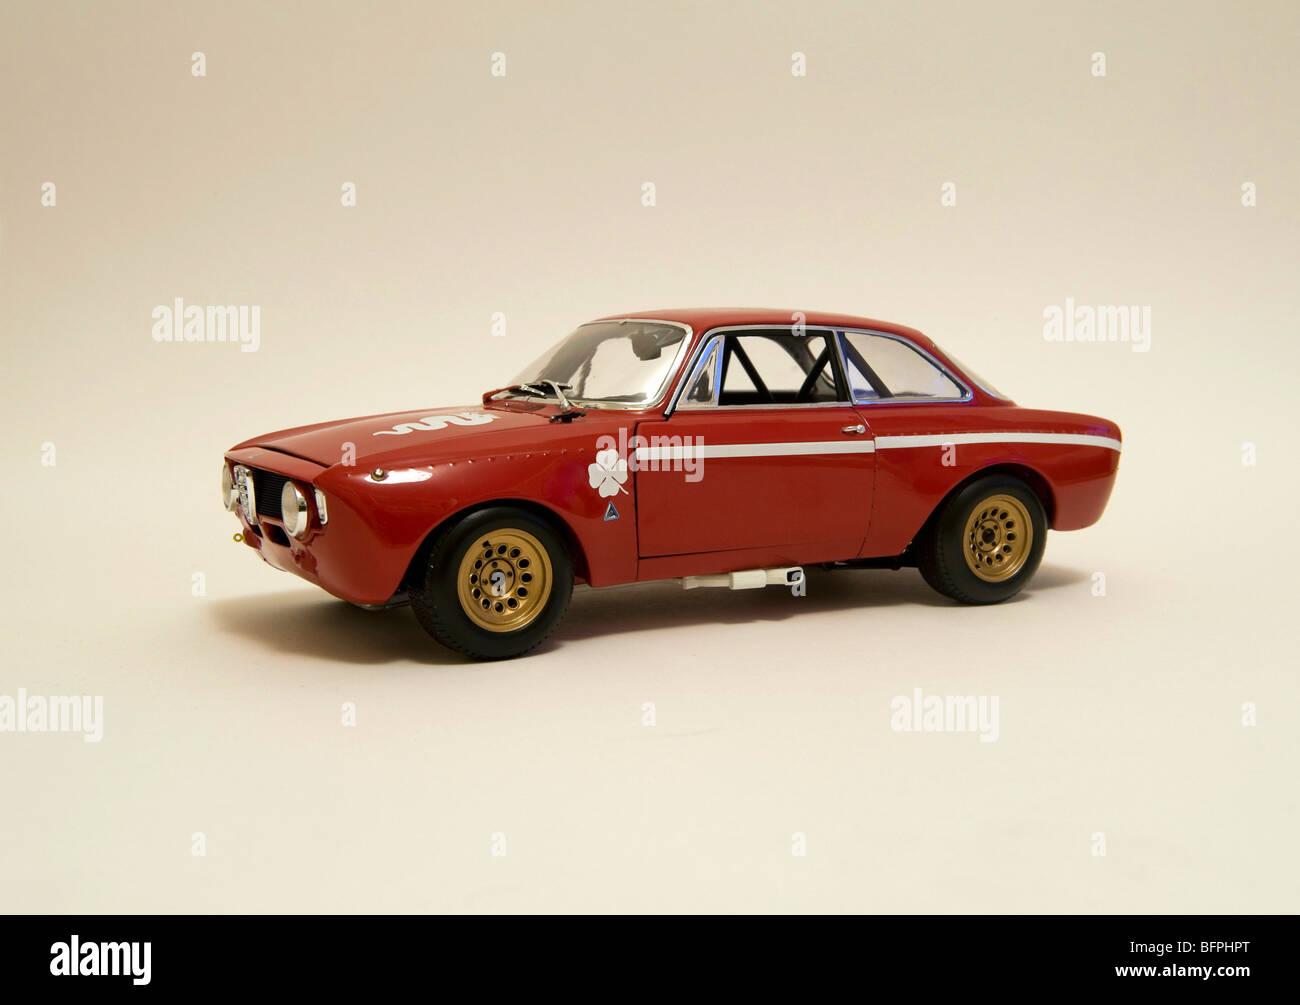 alfa romeo gta 1300 junior 1972 rot modell stockfoto, bild: 26927120